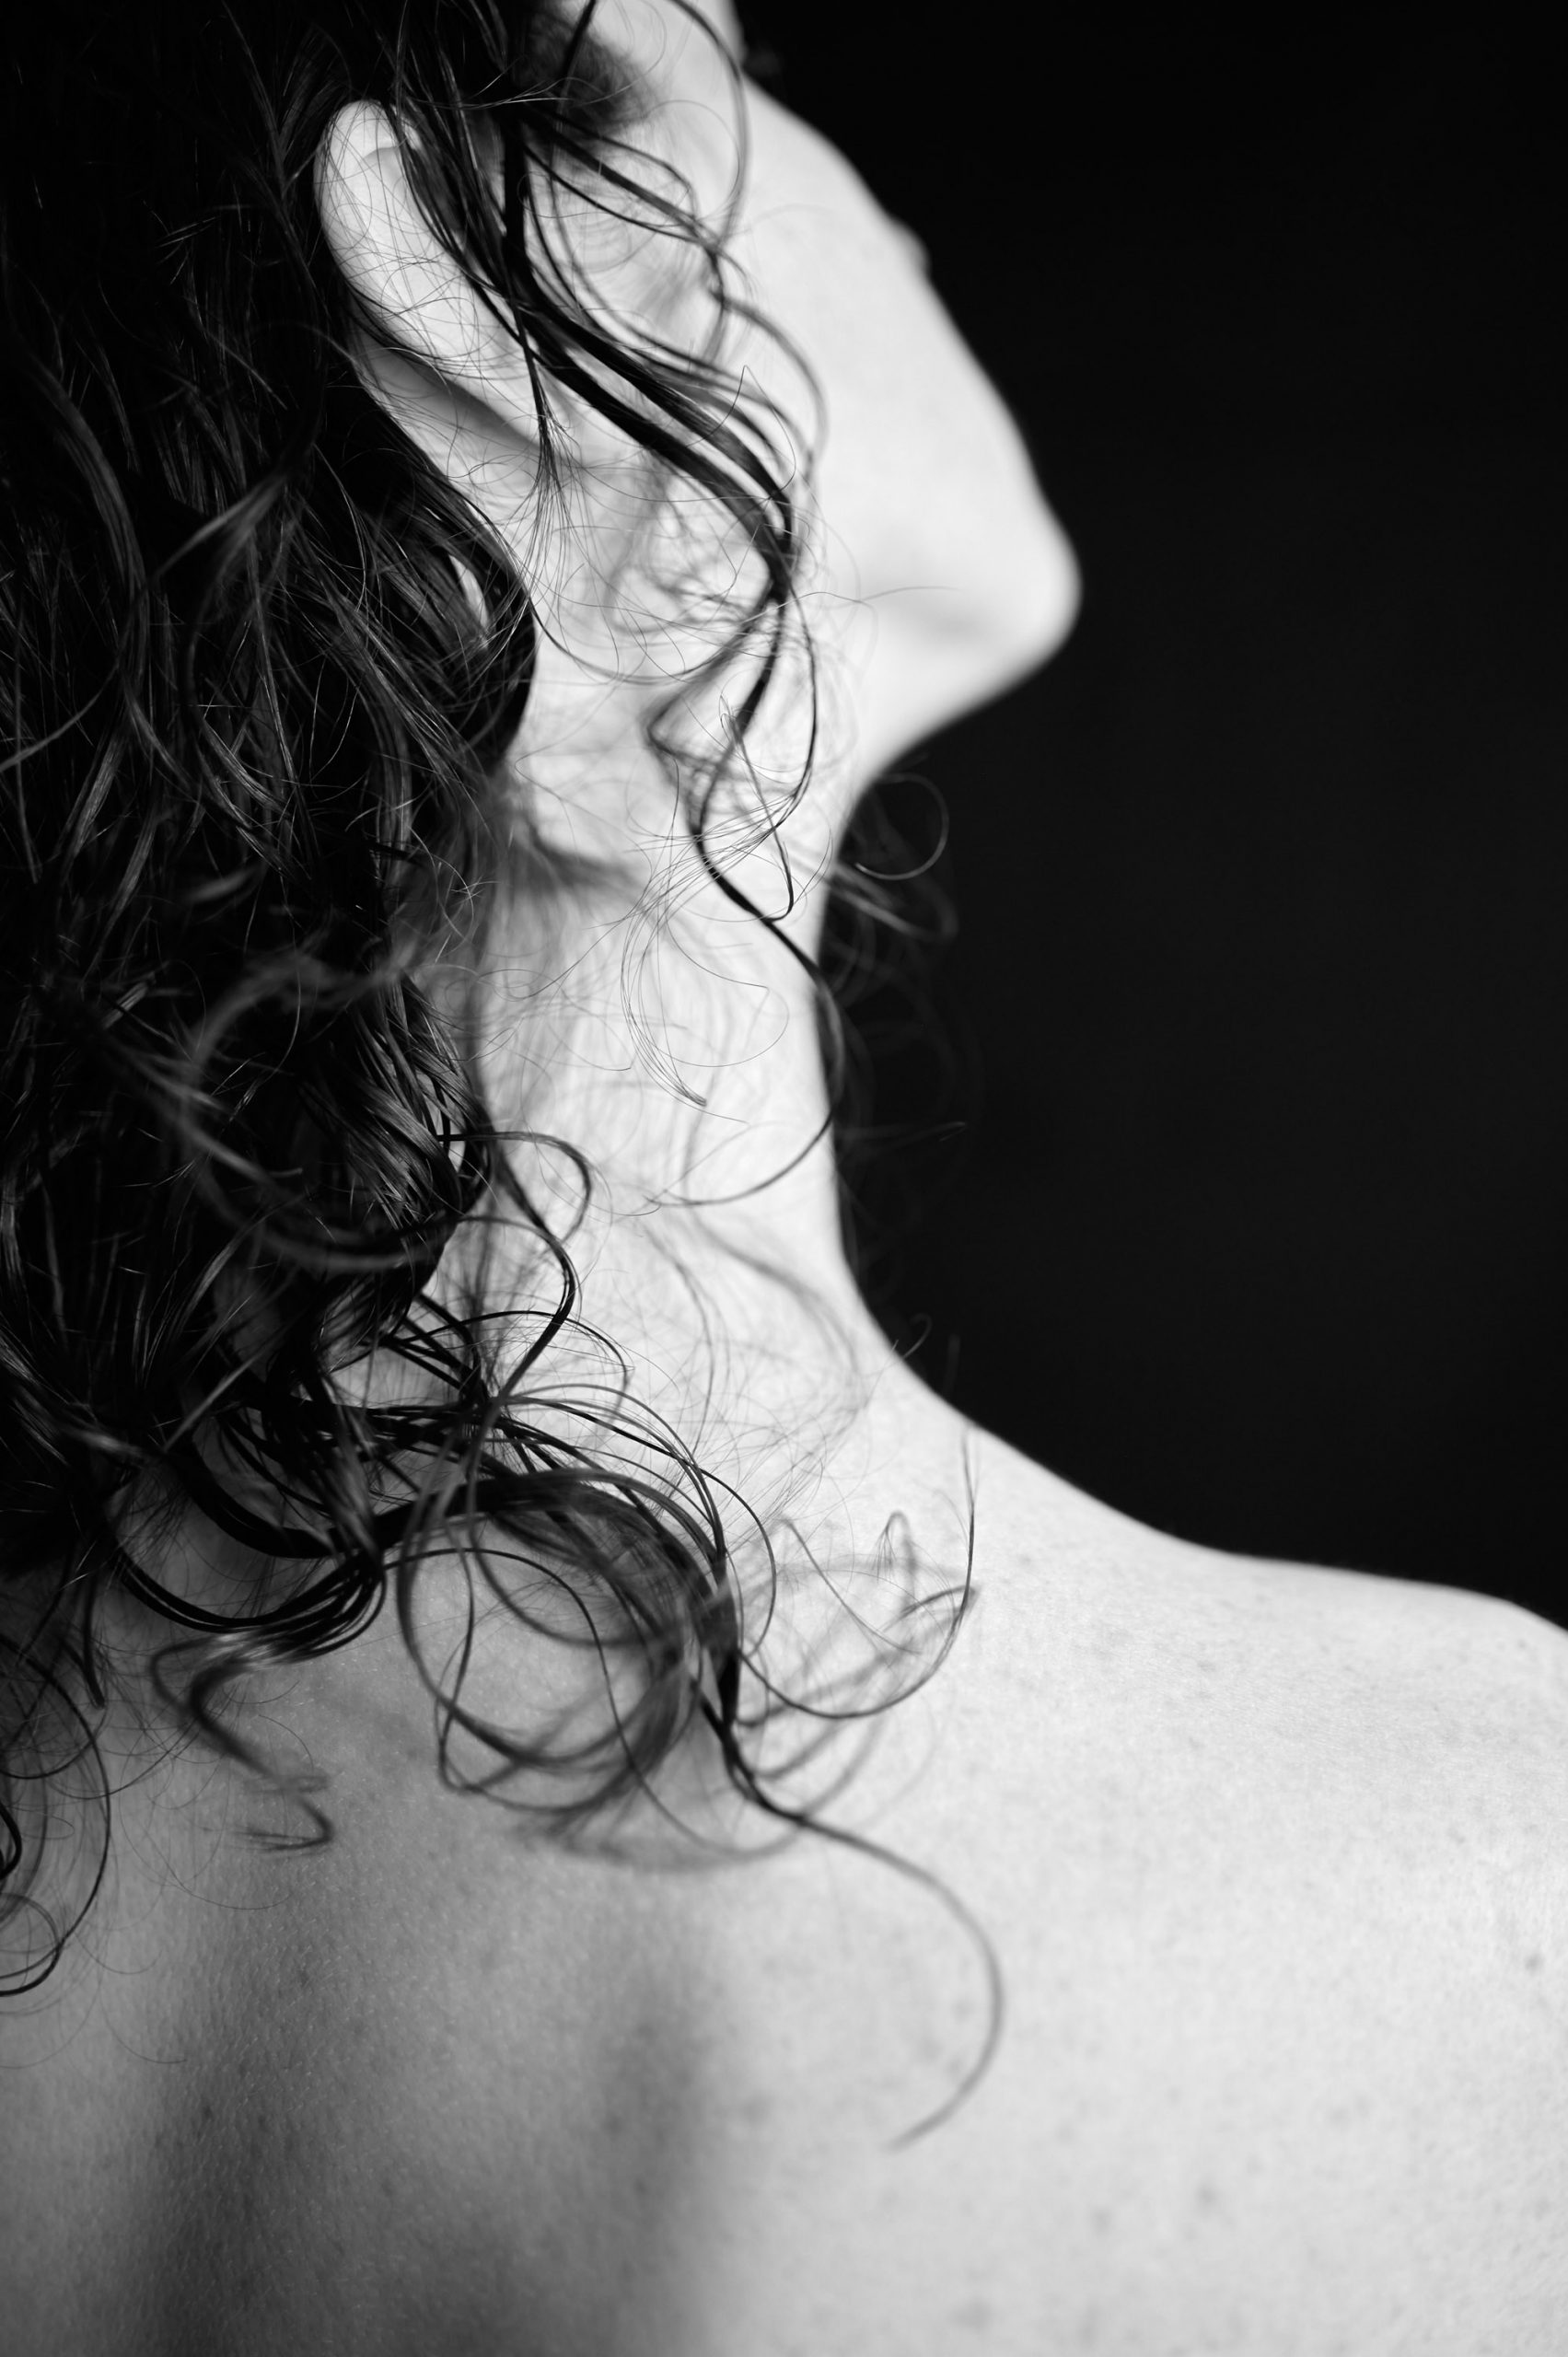 Categories: Boudoir & Nude, Fine Arte, Glamour, Portrait; Photographer: RICCARDO SERAVALLE; Location: Vicenza, VI, Italia